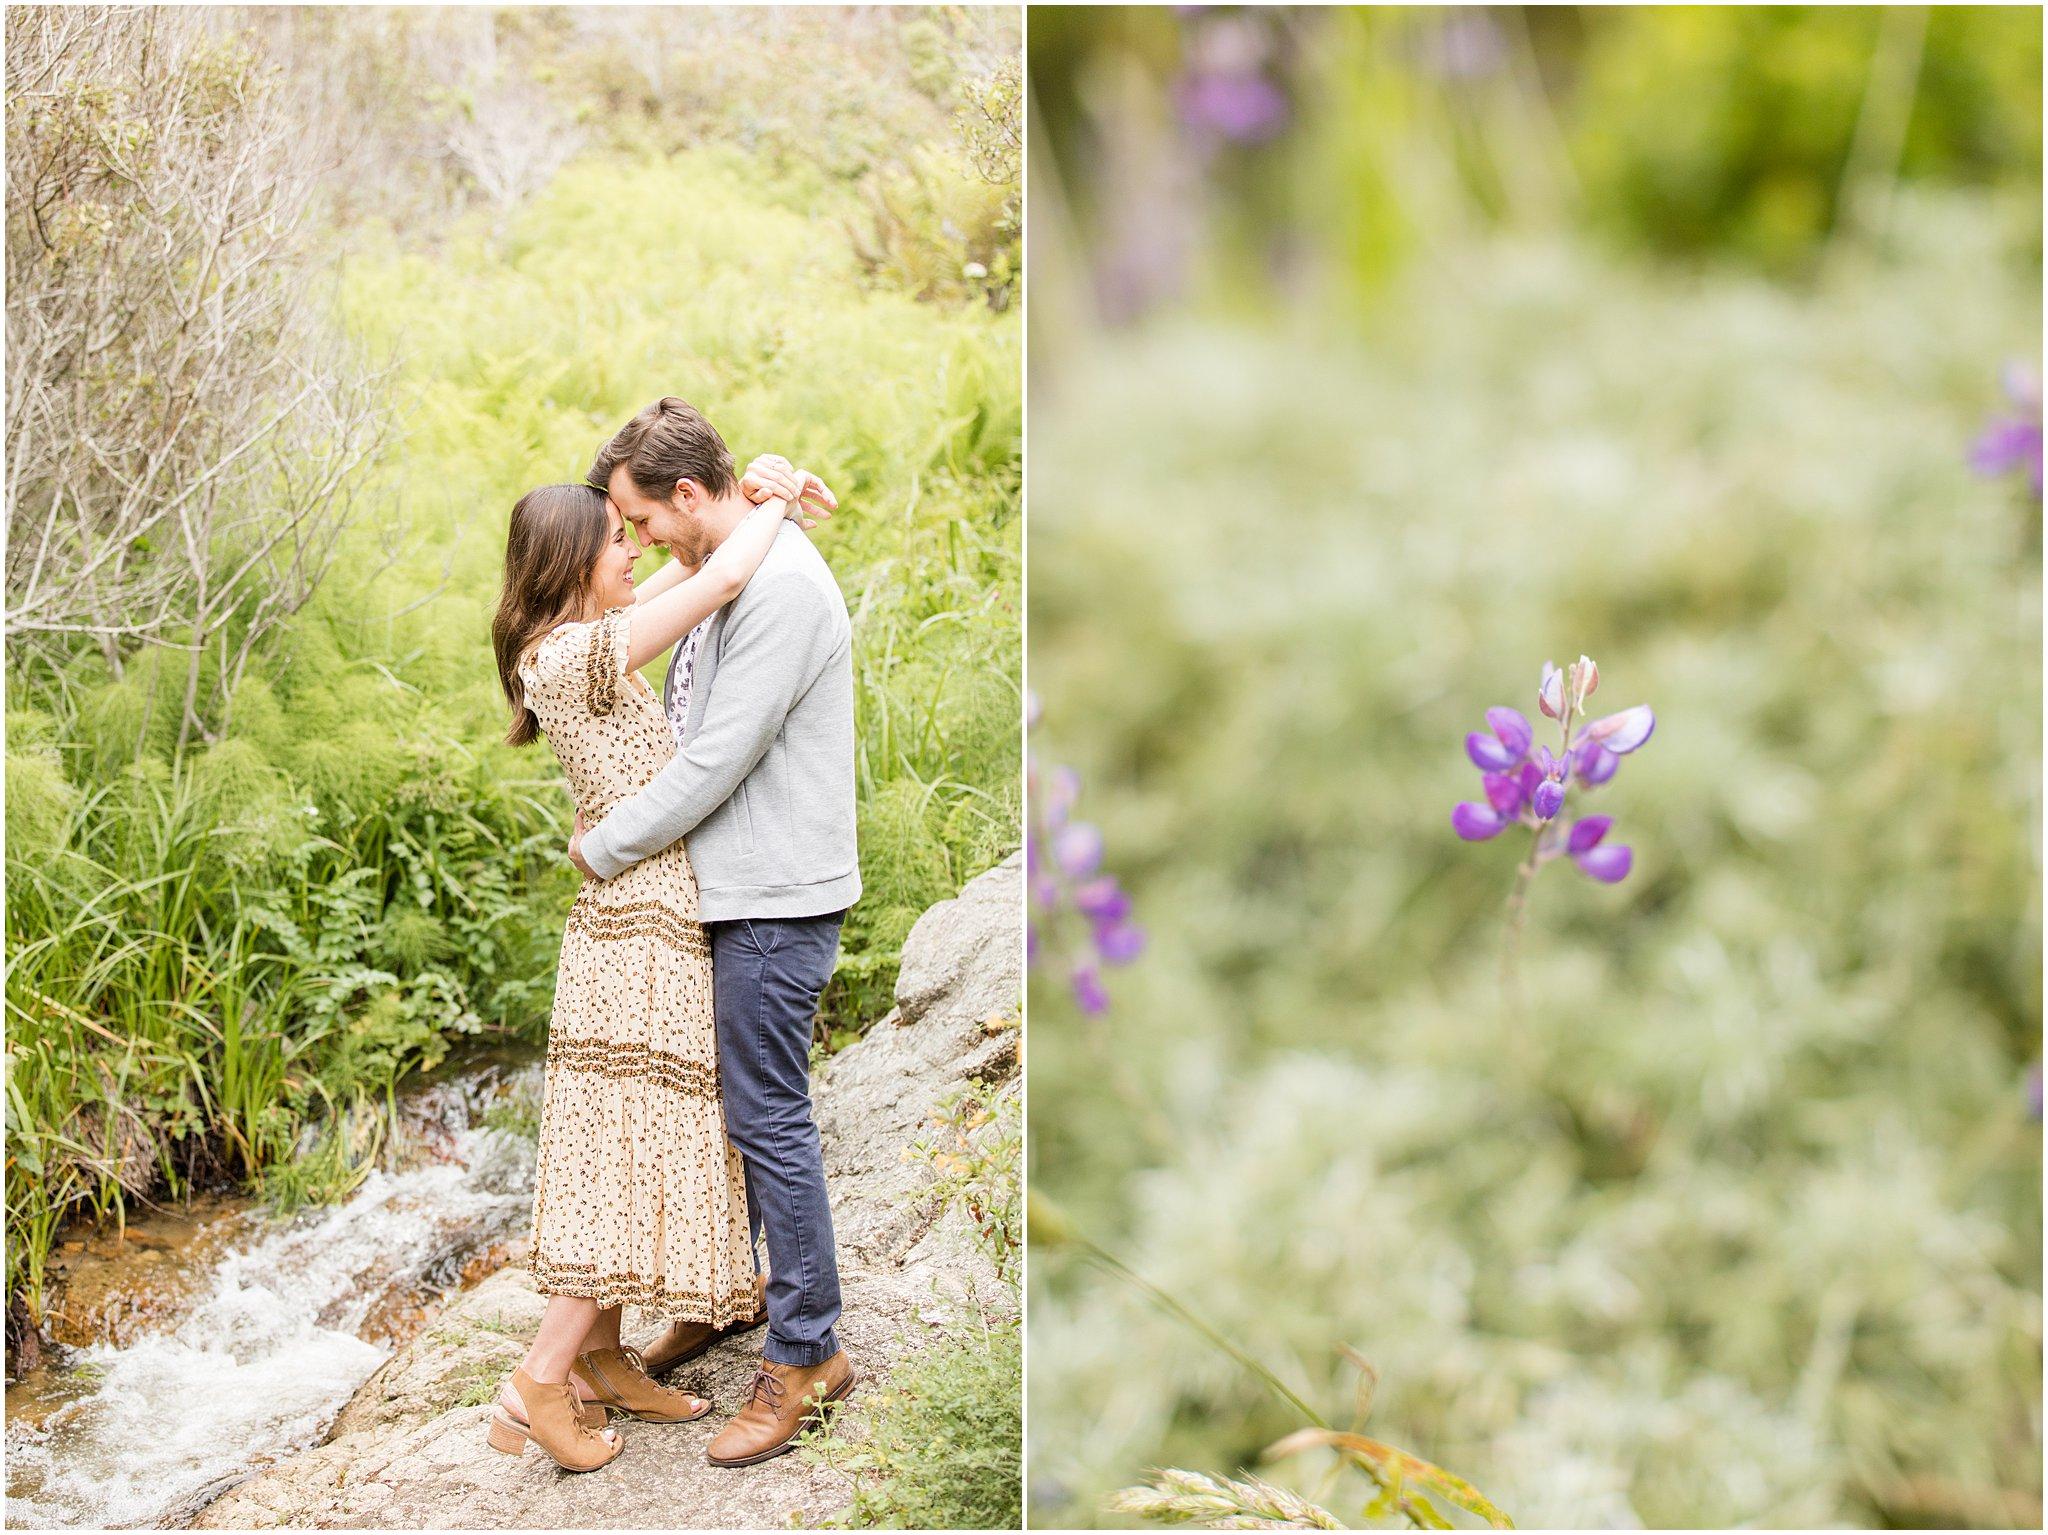 2019 carmel highlands garrapata state park couples portrait session bay area wedding photographer_0004.jpg